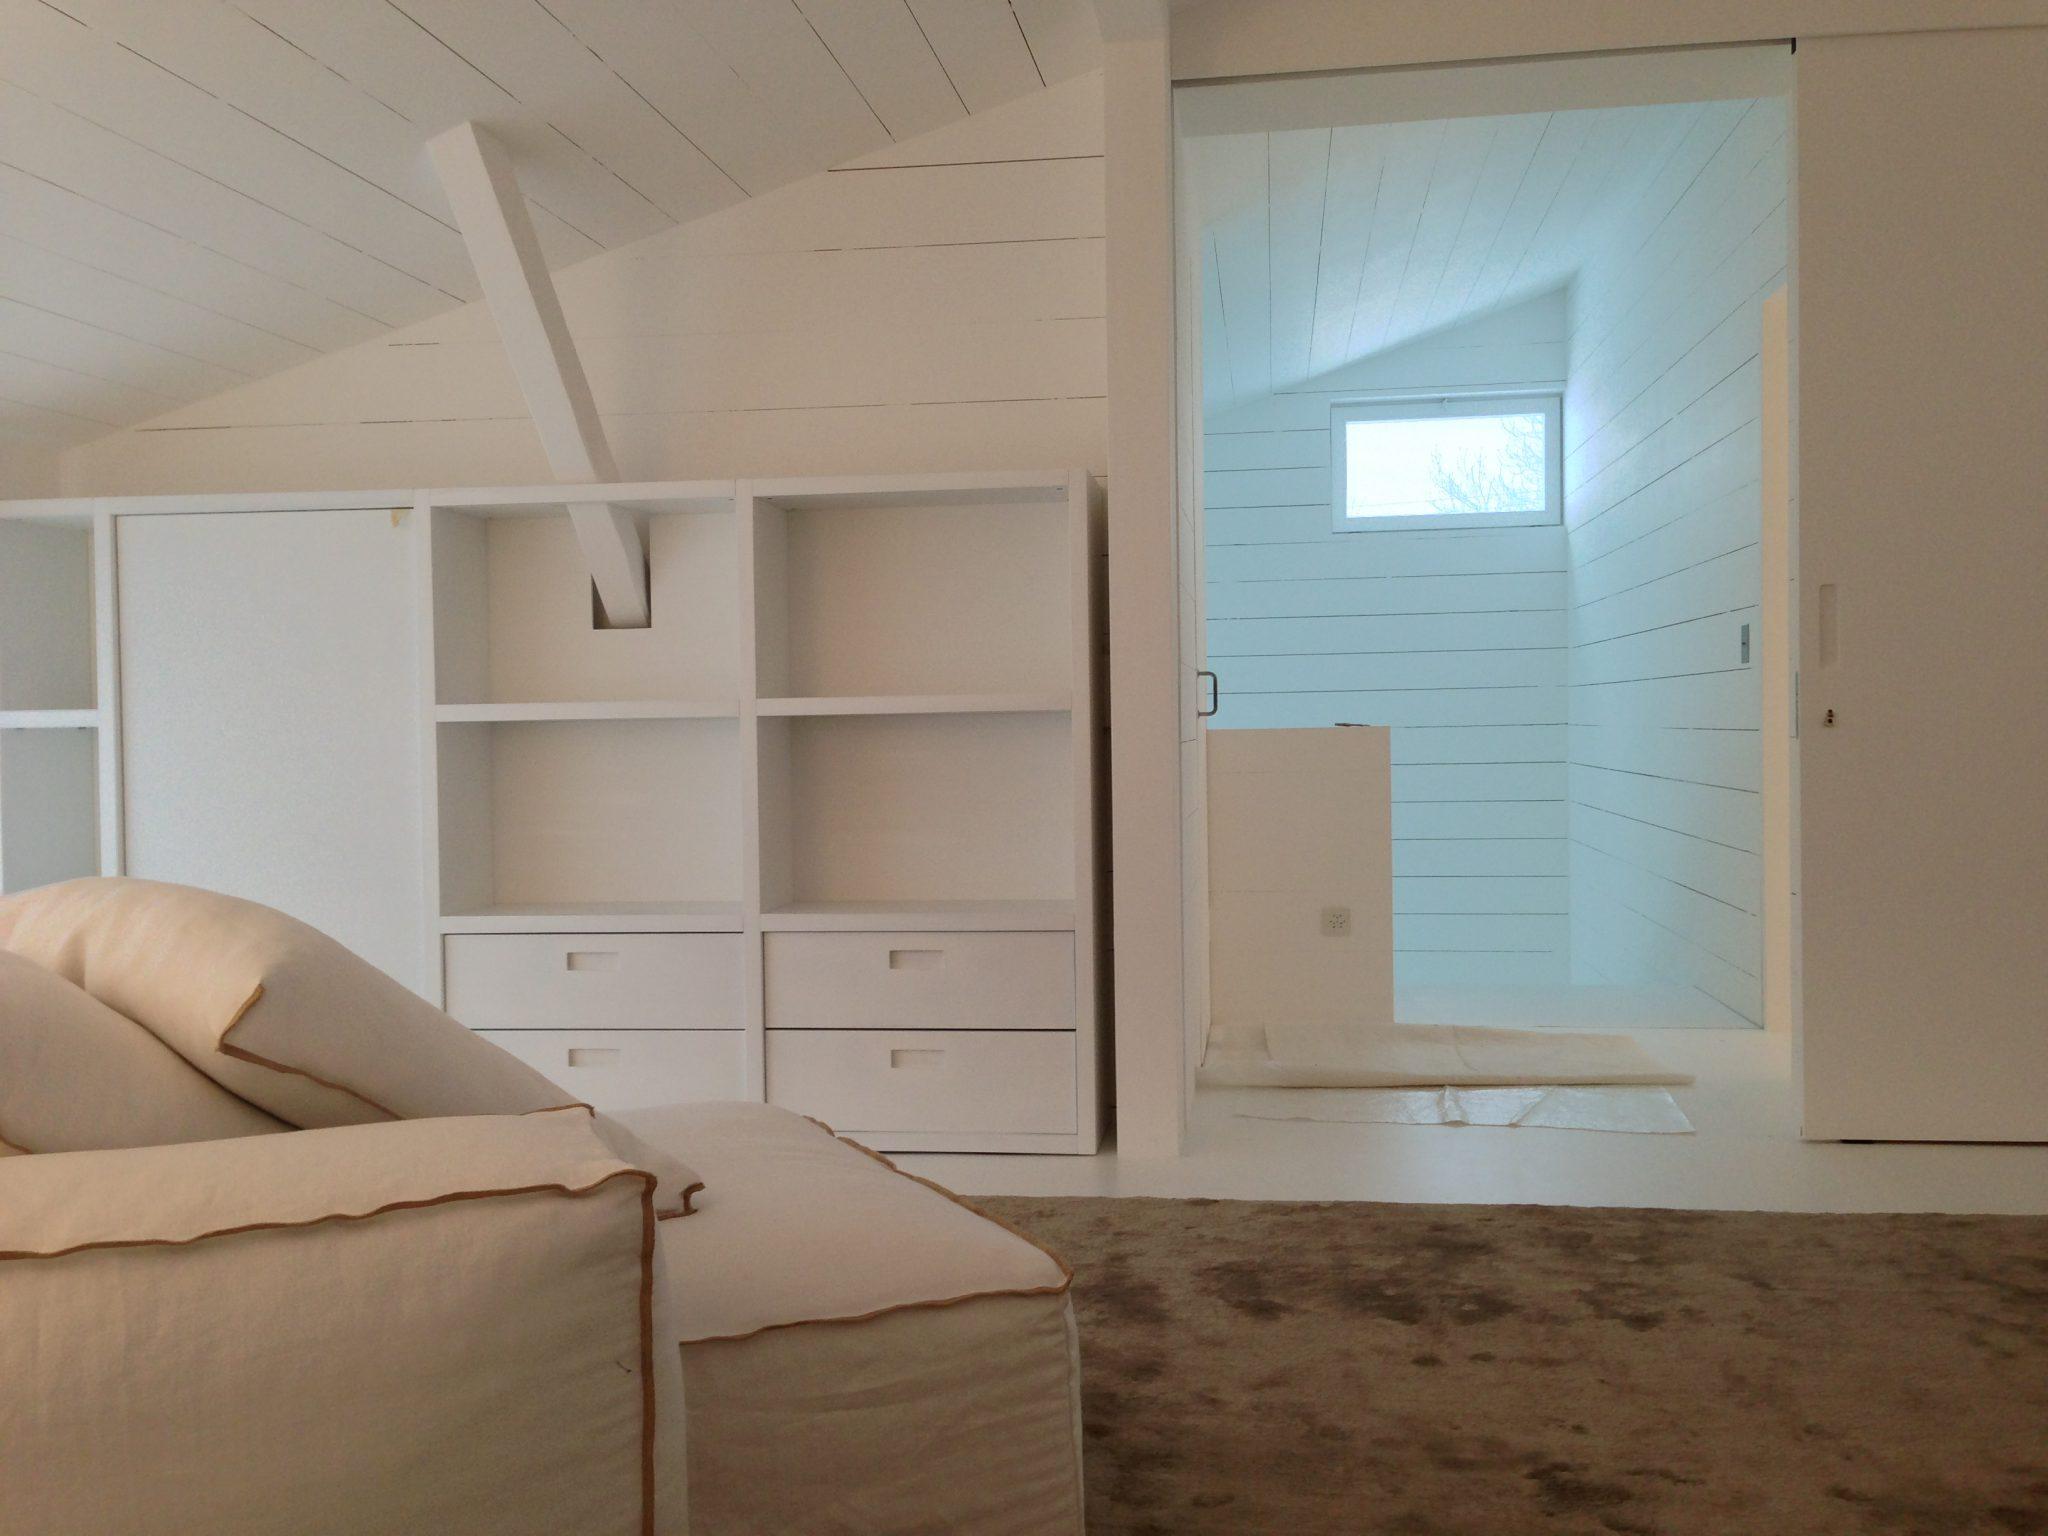 pedro de matos mati res et couleurs. Black Bedroom Furniture Sets. Home Design Ideas